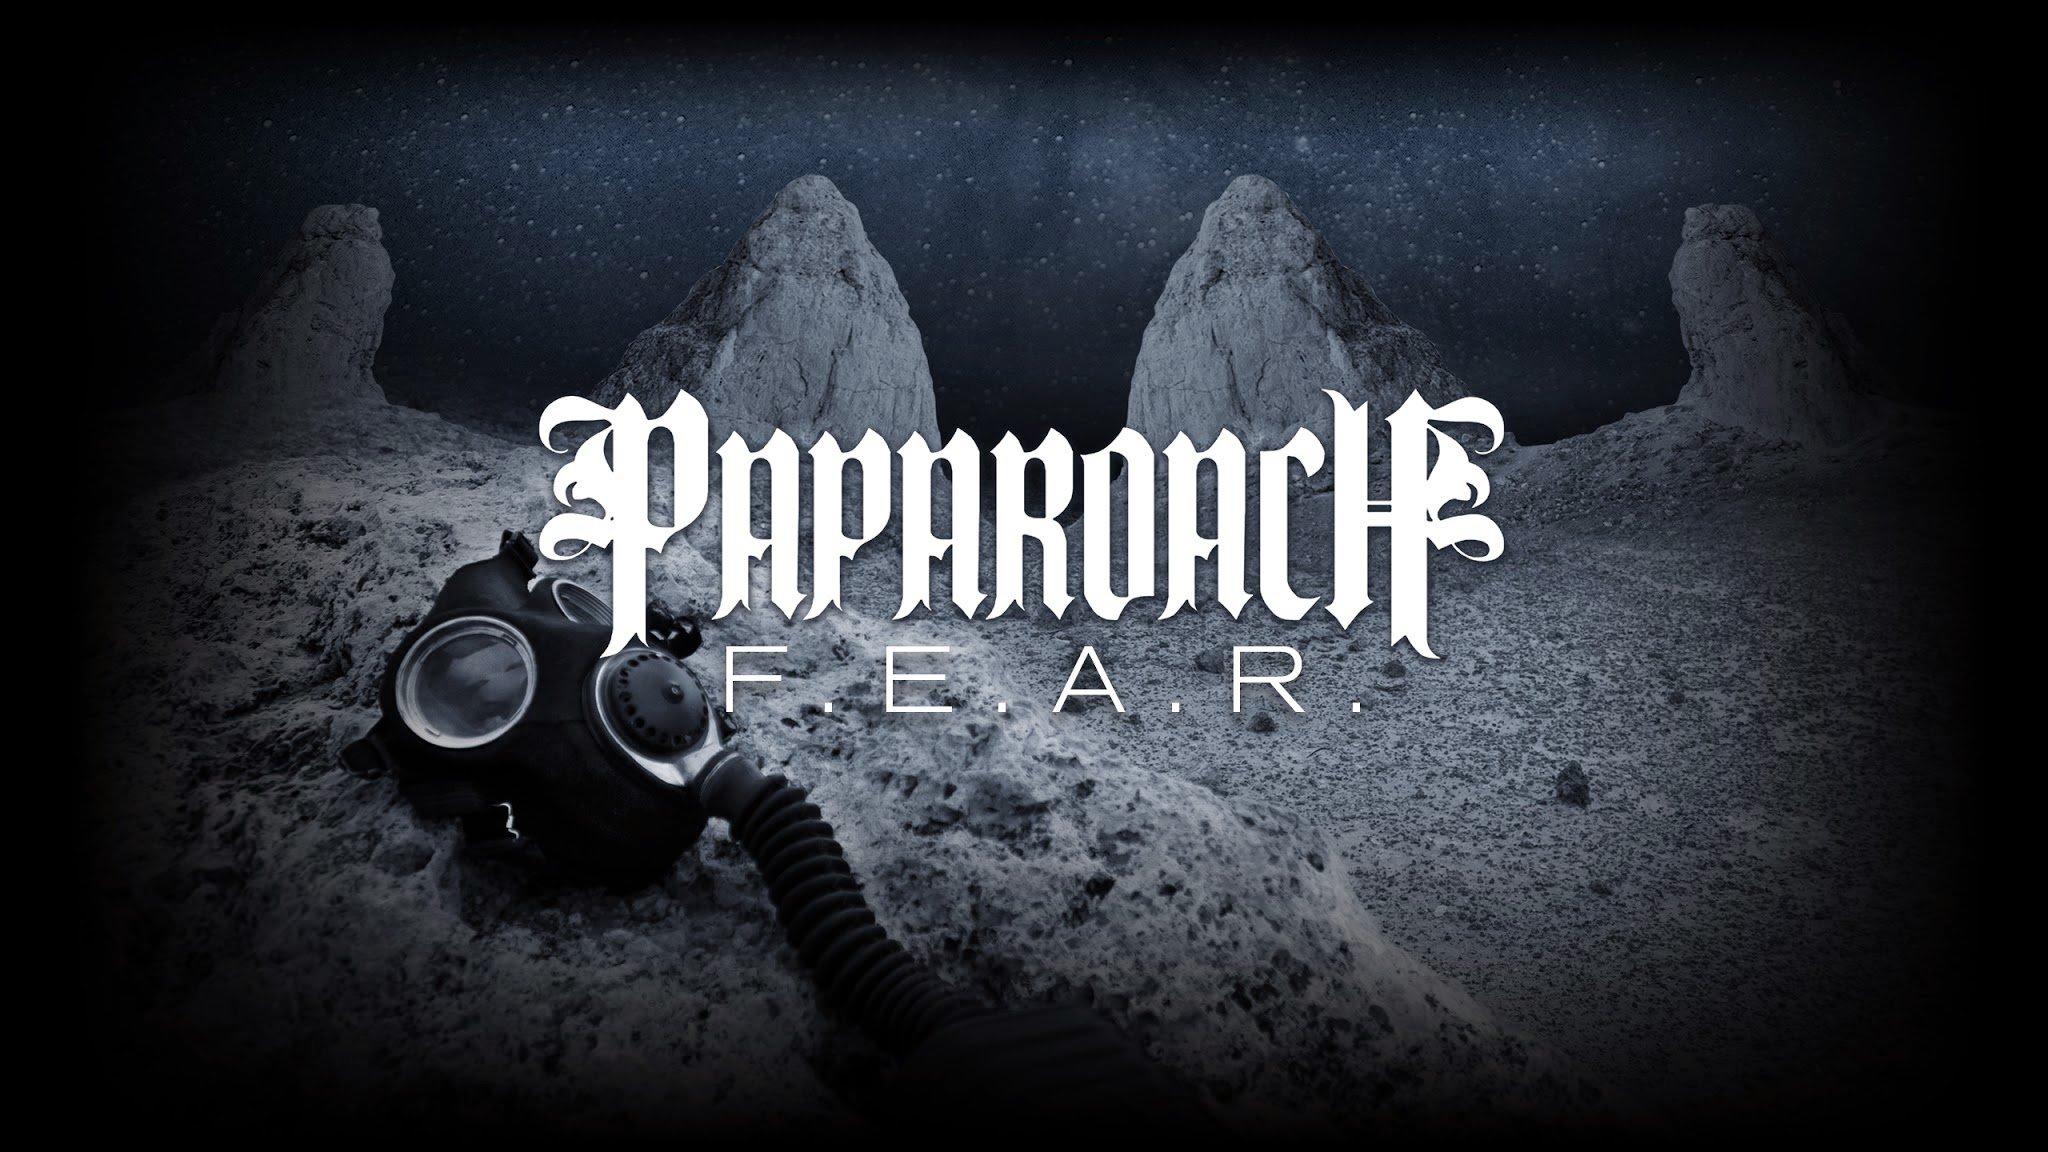 Papa Roach Wallpaper - WallpaperSafari